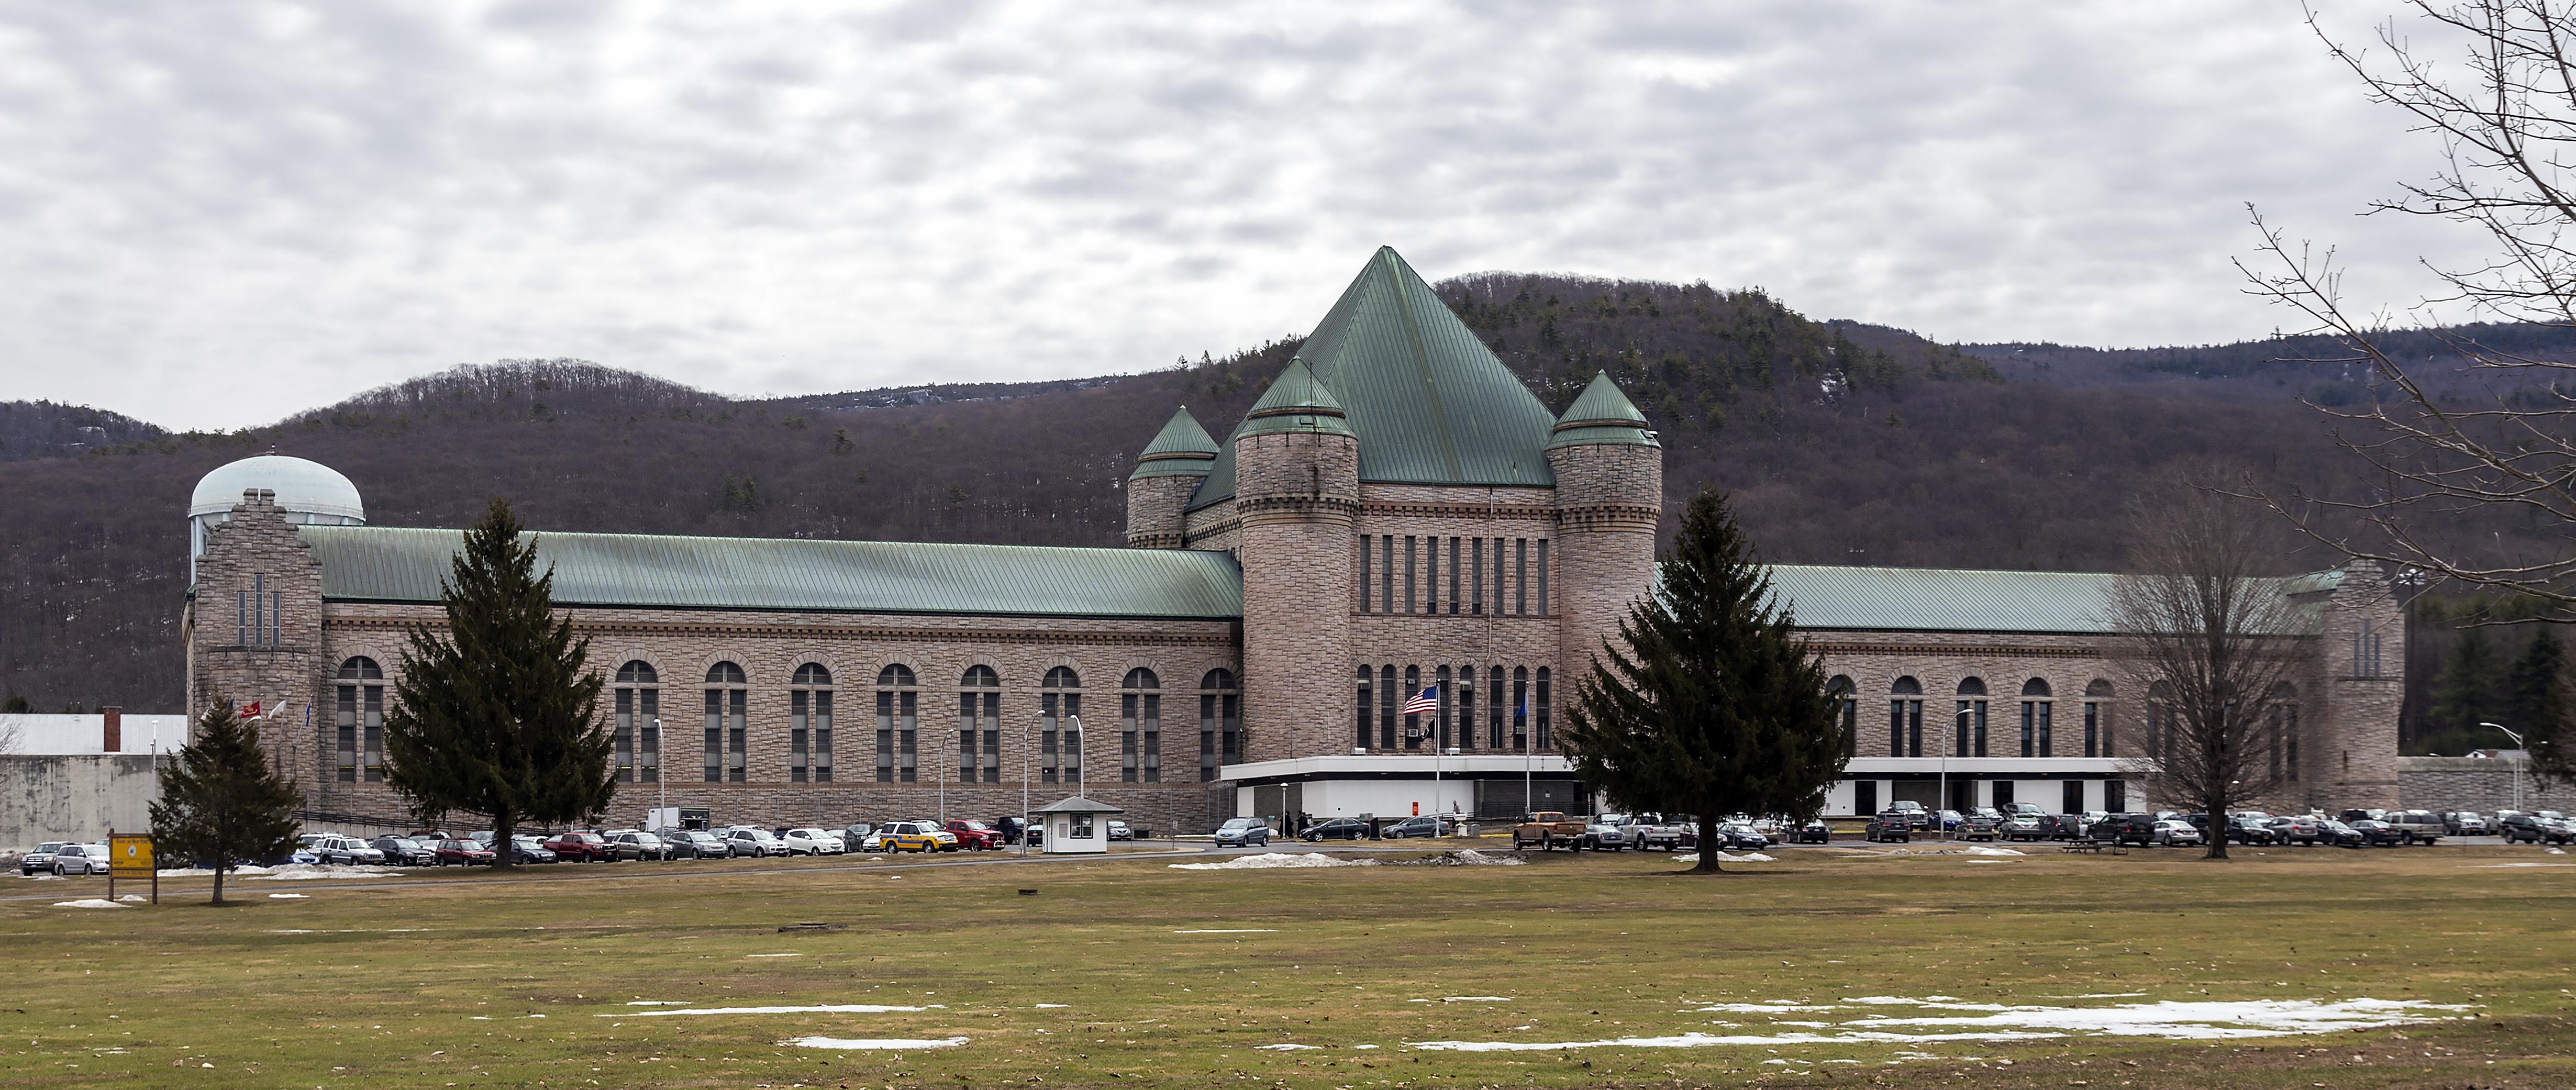 Eastern Correctional Facility - Wikipedia